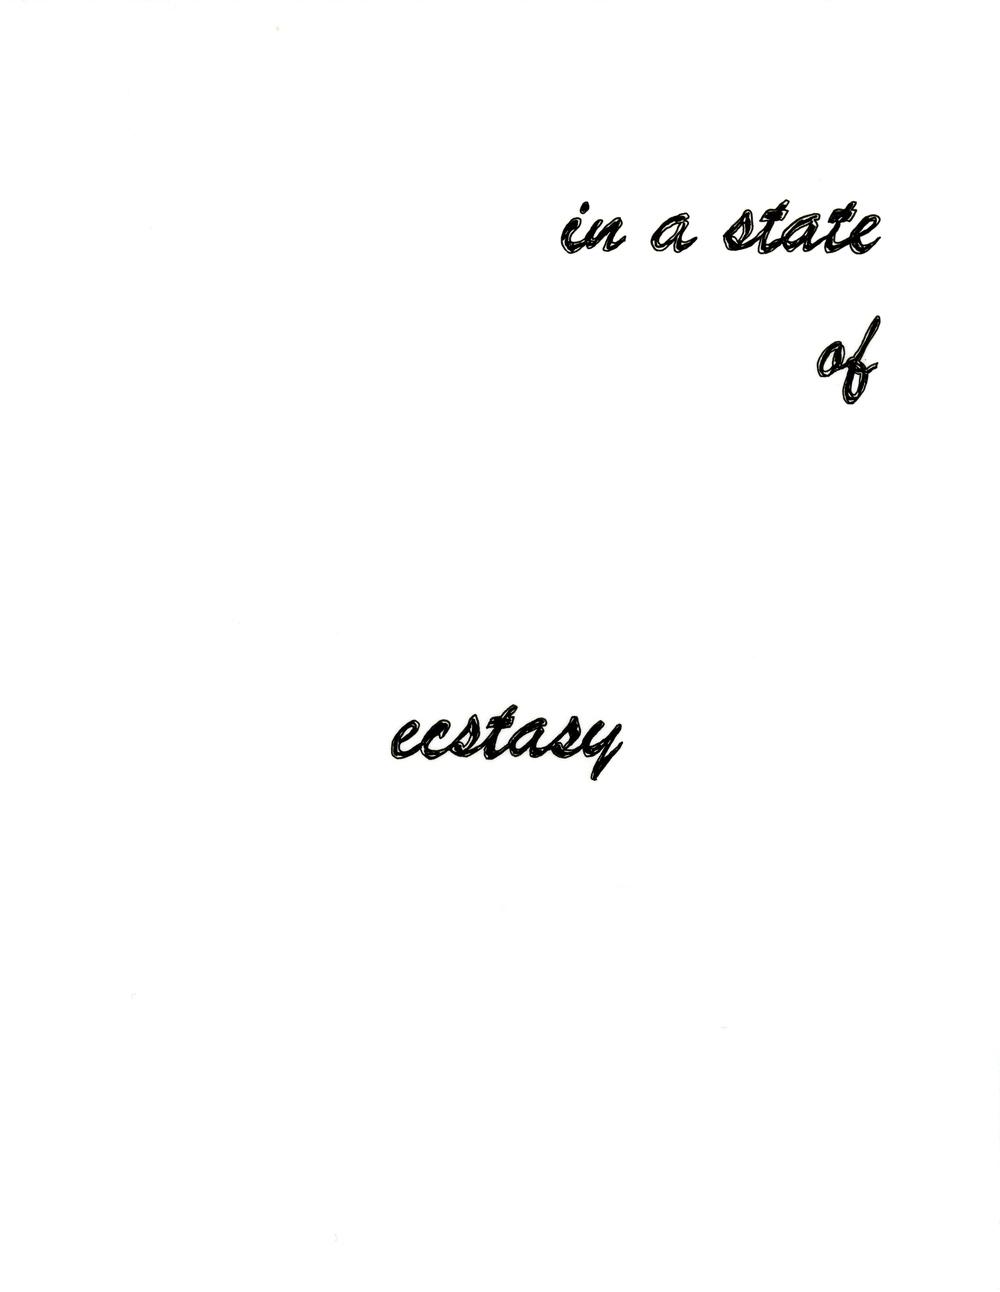 Ecstasy Text002.jpg